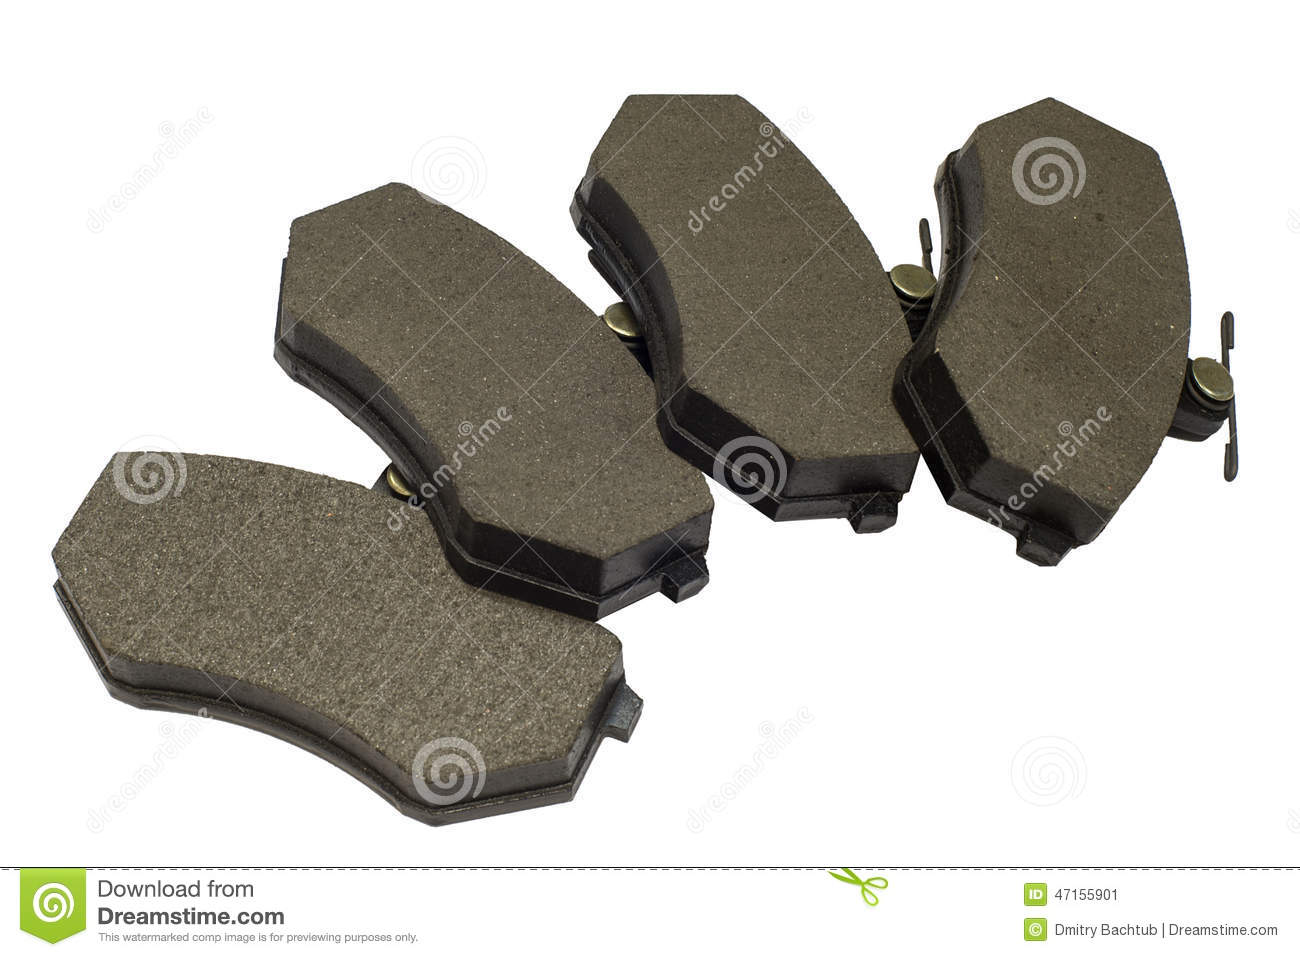 Комплект тормозных колодок ALLIED NIPPON ADB01604 фото